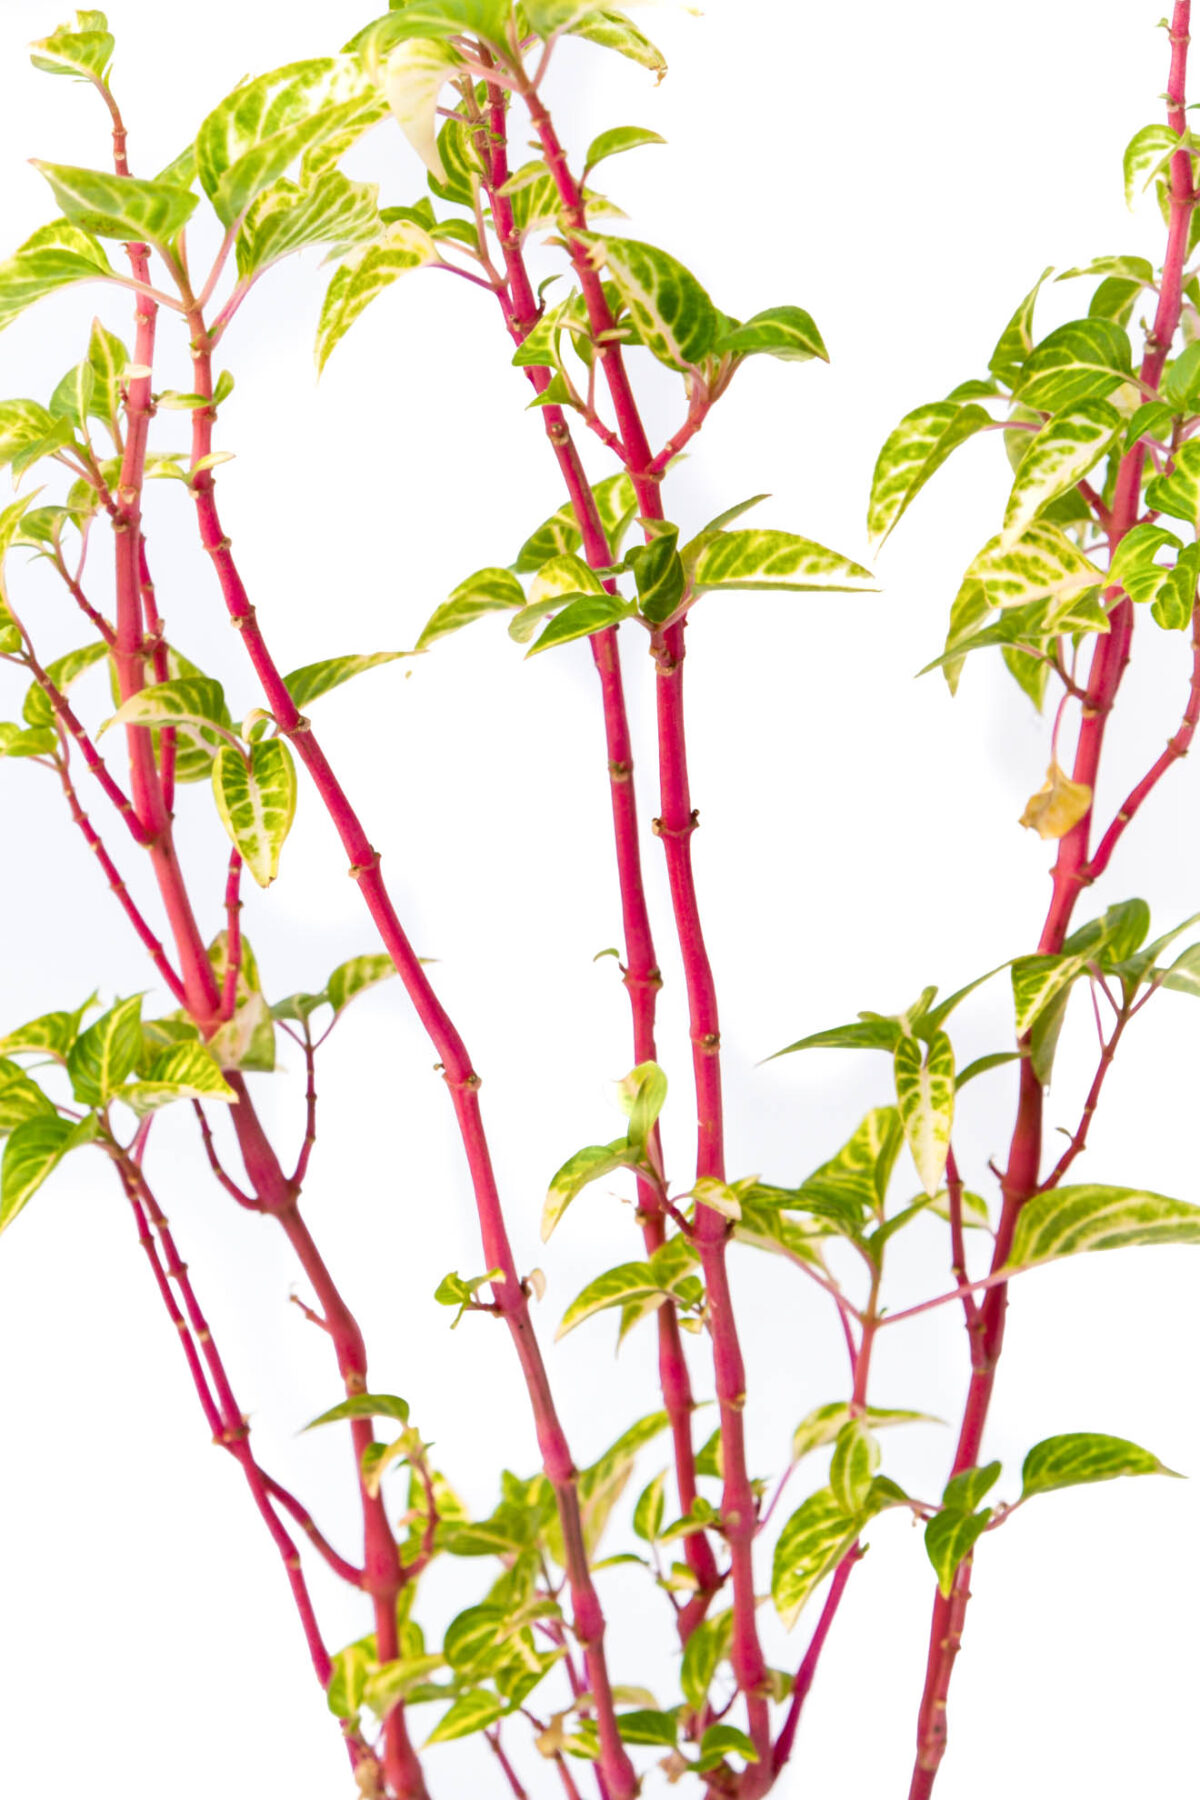 Iresine Herbstii Plant